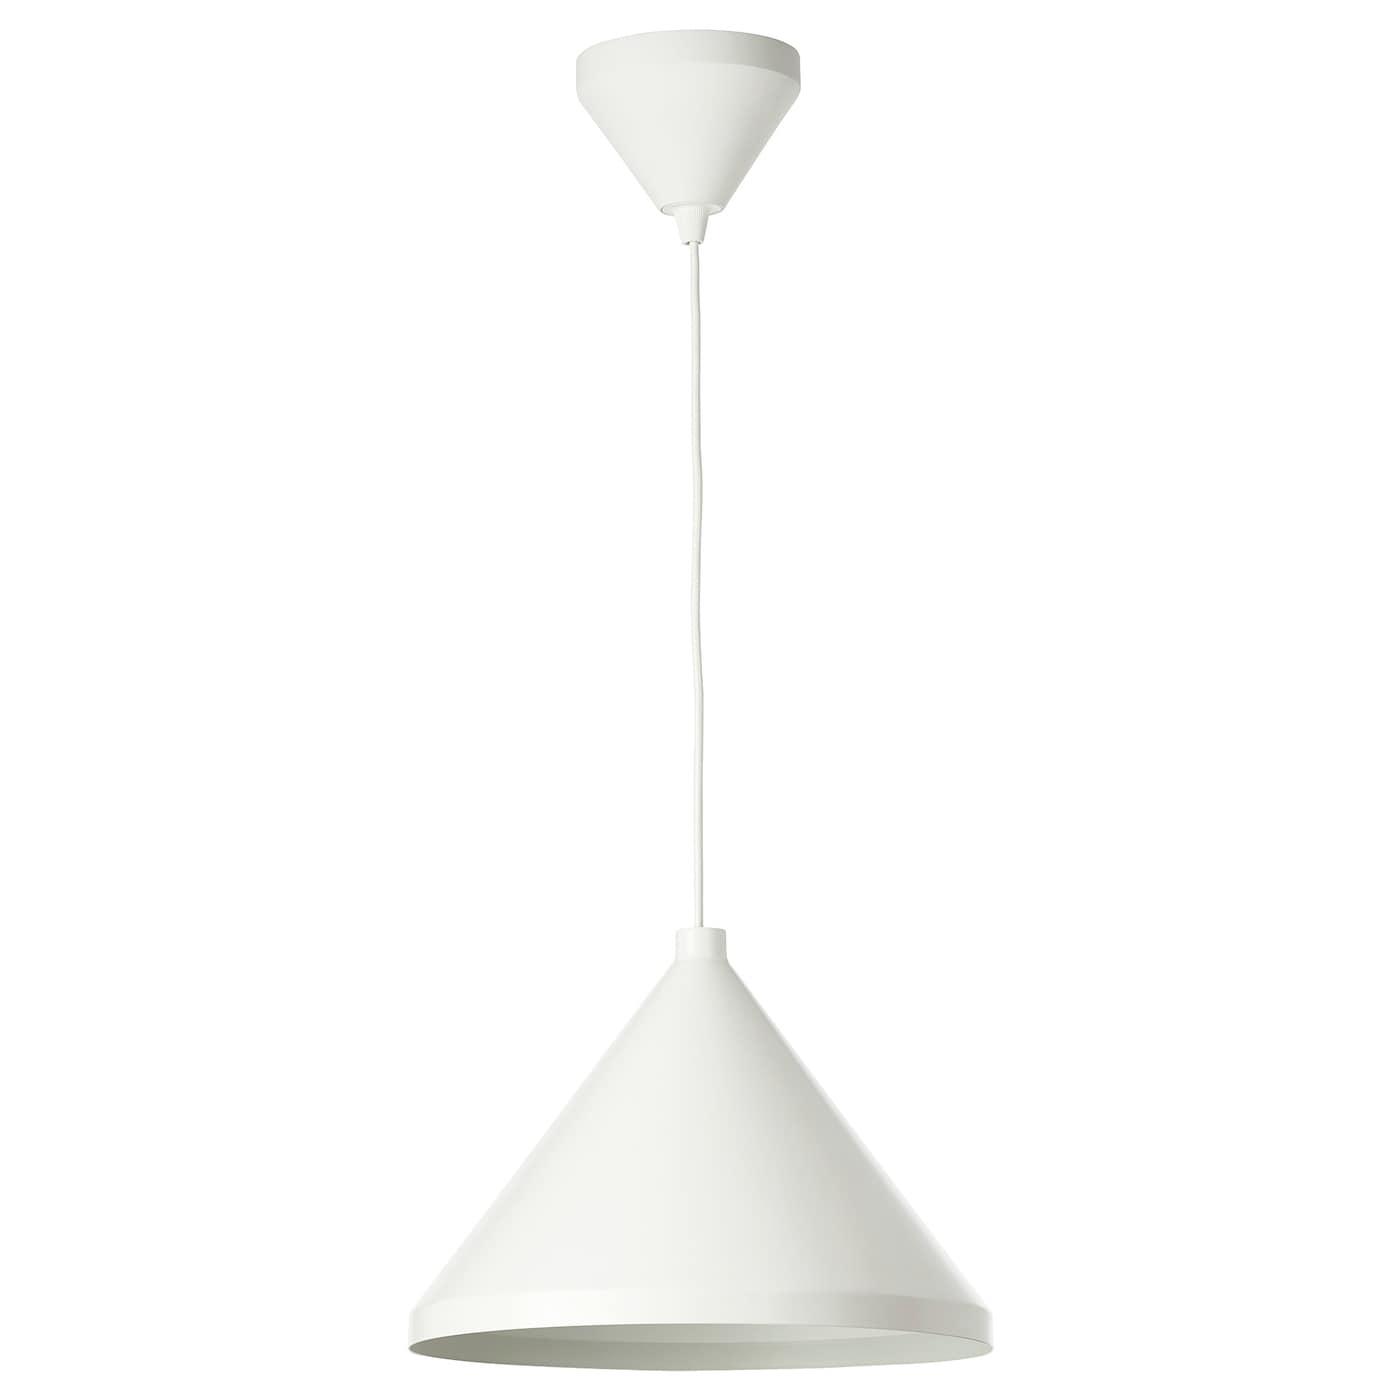 "Shop NÄVLINGE Pendant lamp, white, 13"" from Ikea on Openhaus"